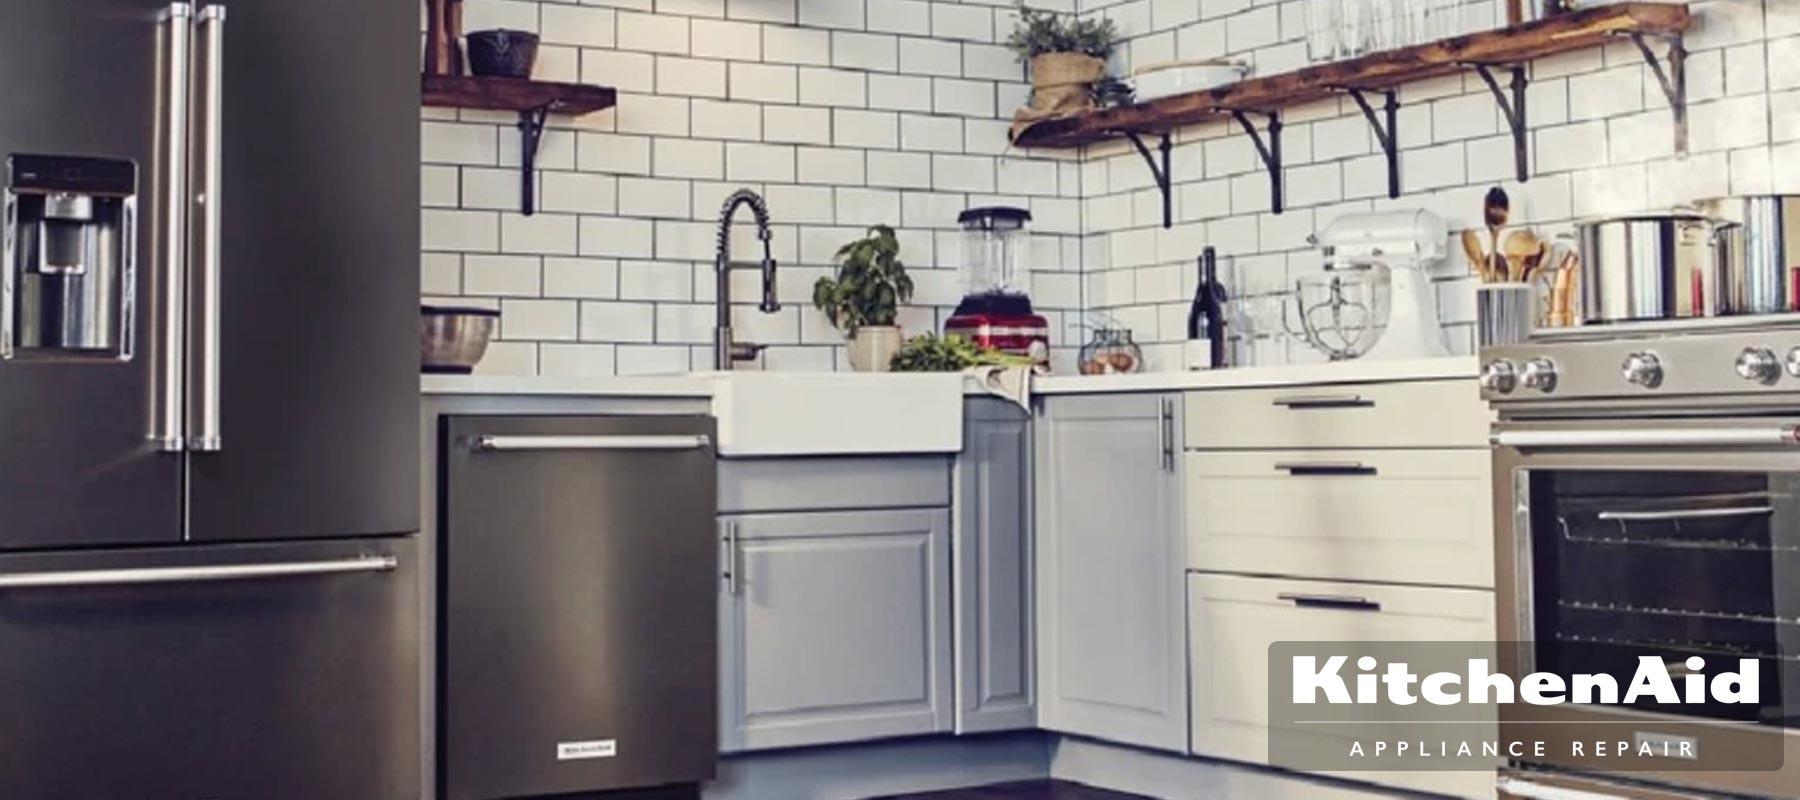 Quality Kitchenaid Authorized Repair Service | KitchenAid Appliance Repair Professionals